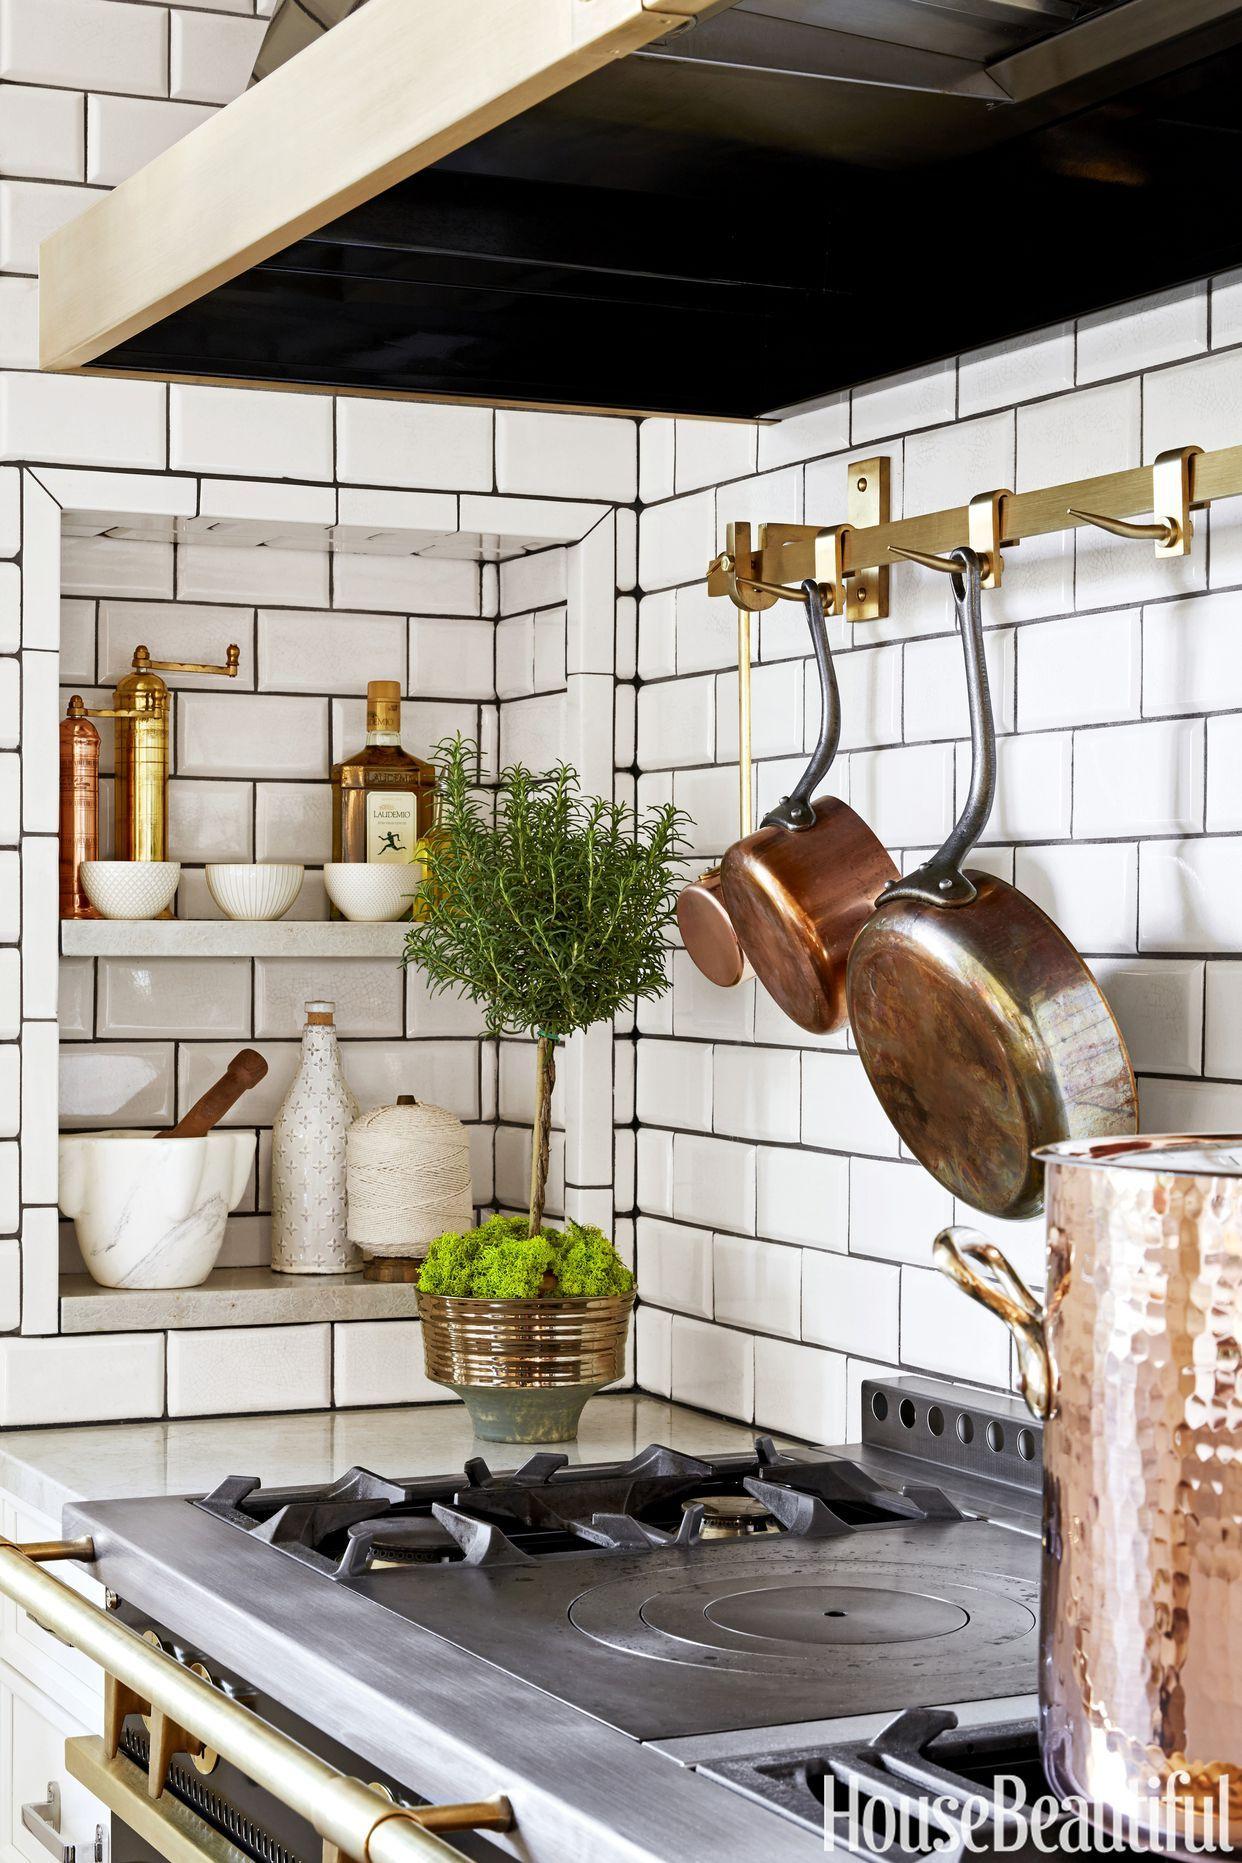 8 Ingredients For A Professional Grade Kitchen Cocinas Piscinas